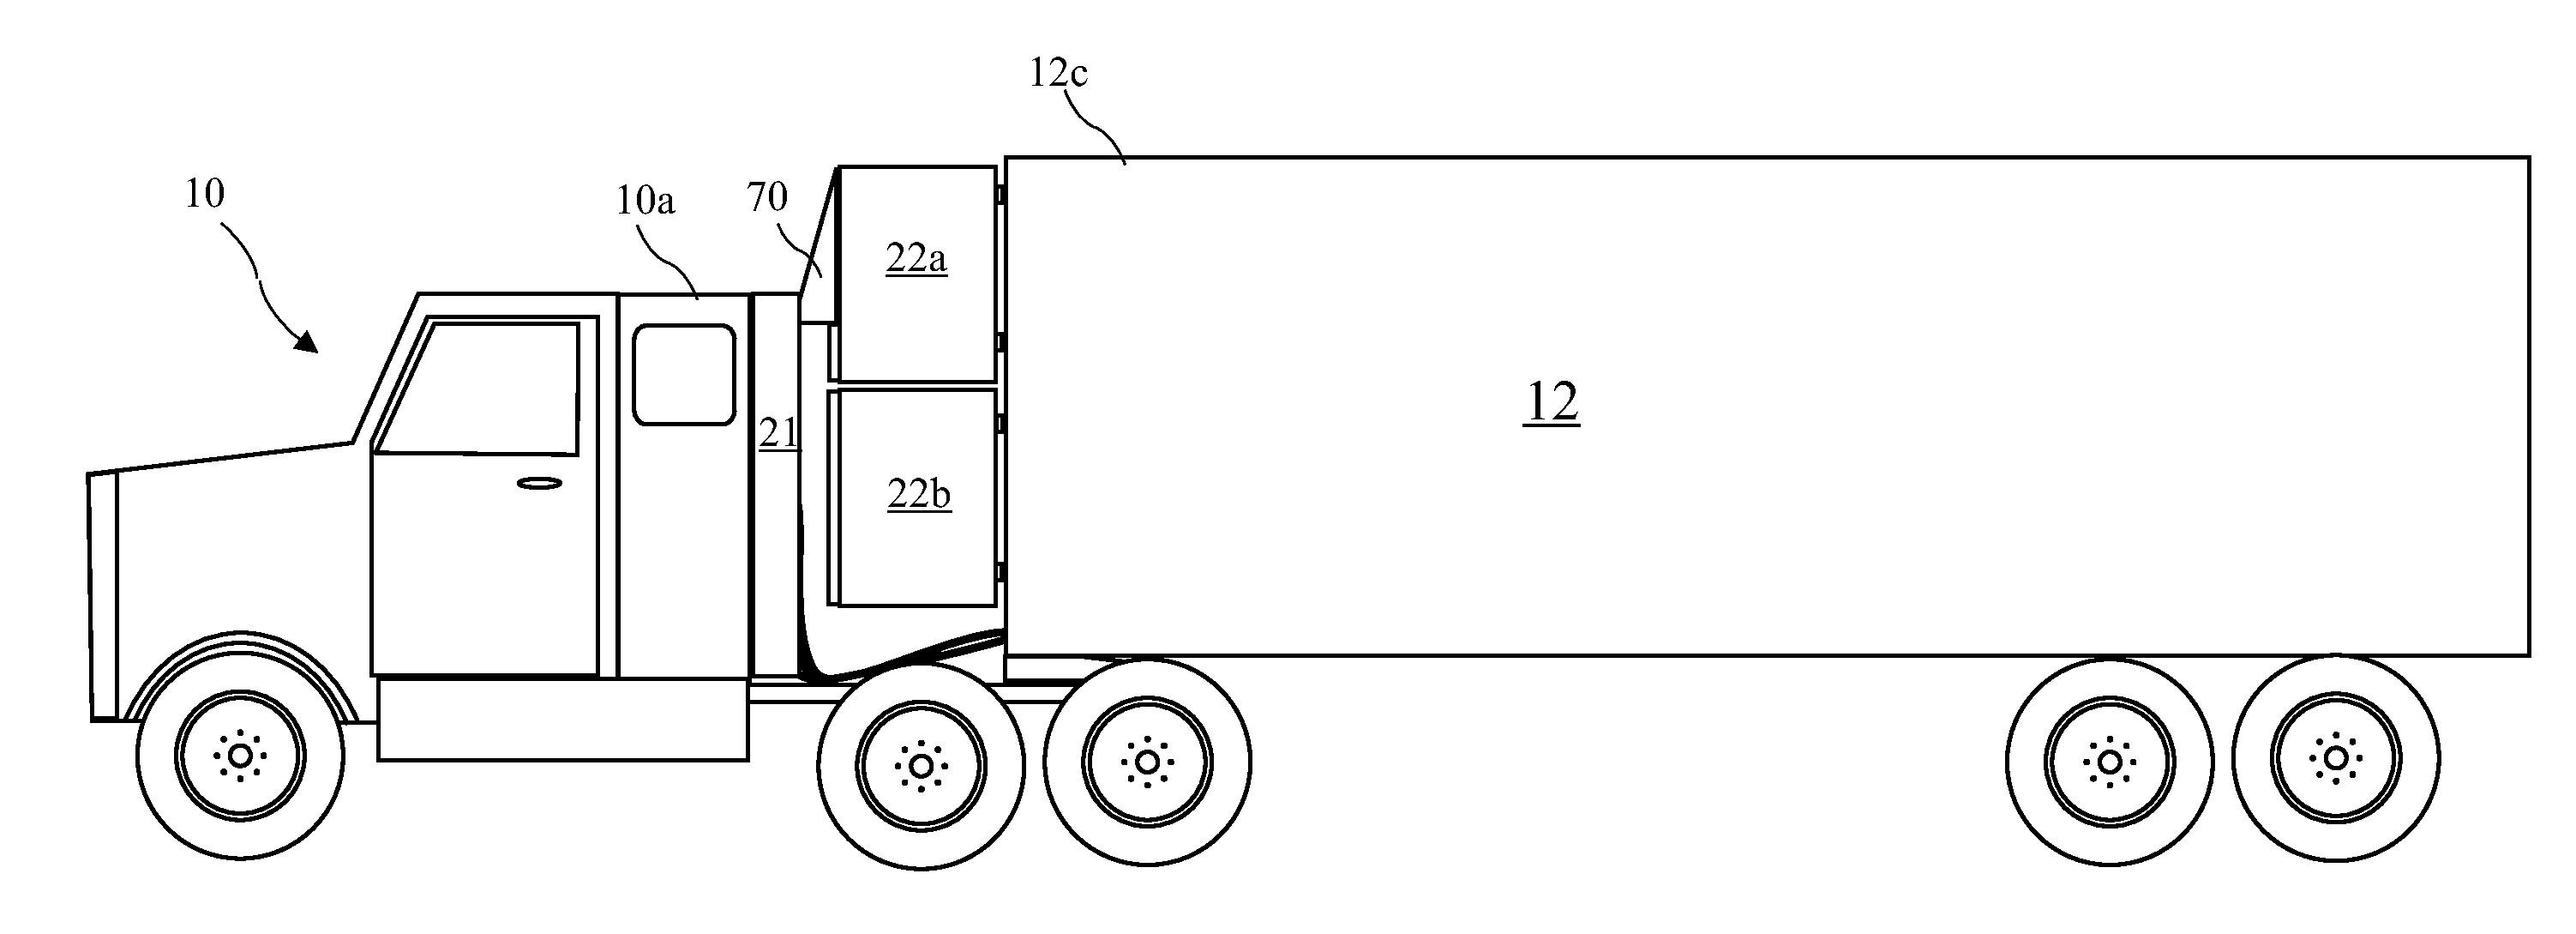 Semi Truck Inspection Diagram